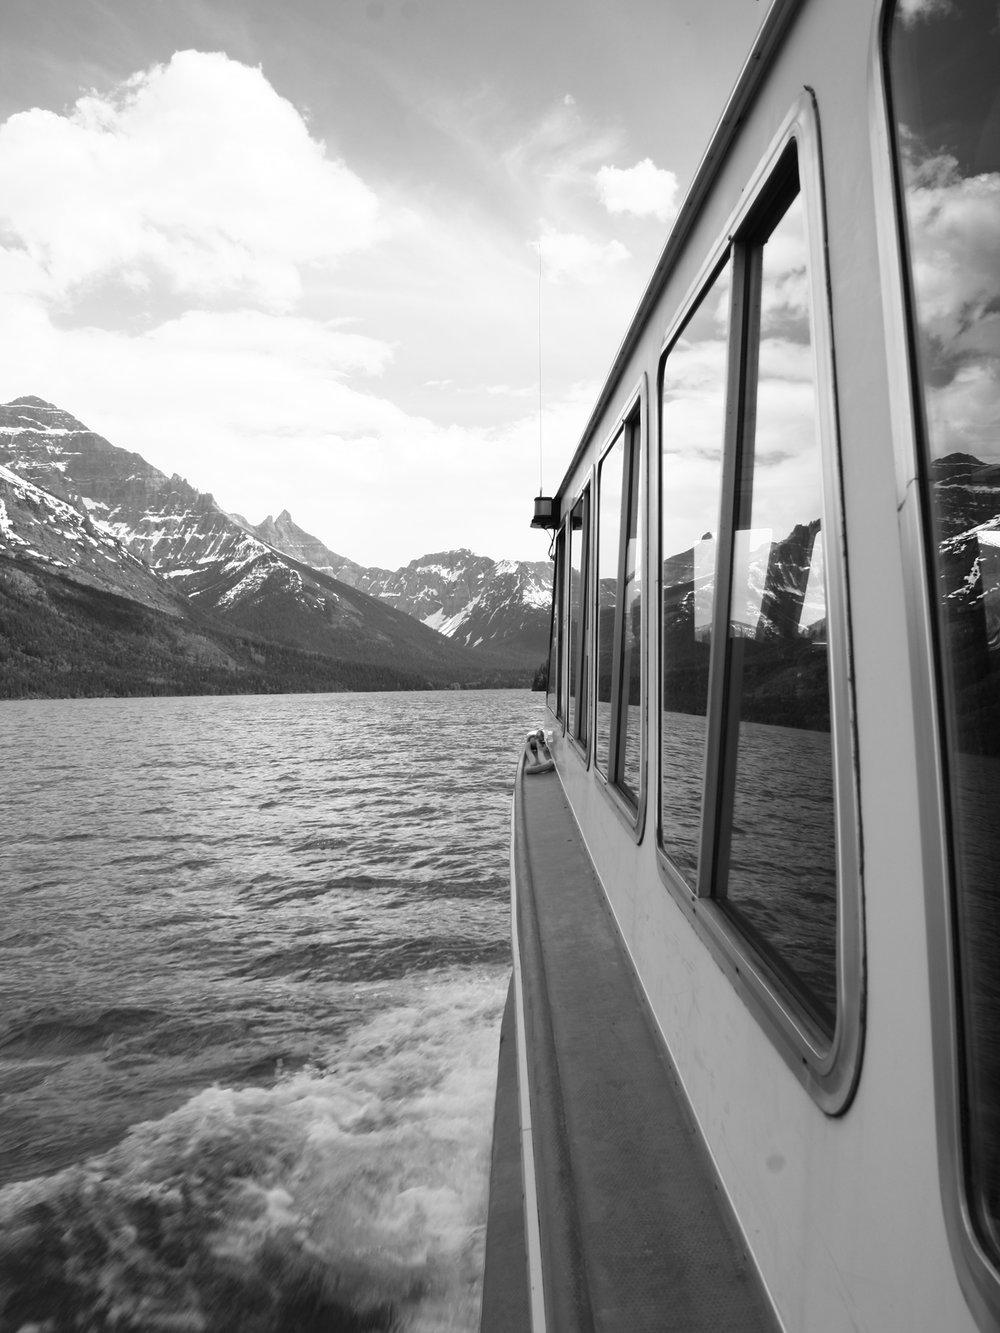 Boat Trip on Waterton Lake , Alberta Canada to Goat Haunt, Montana, USA